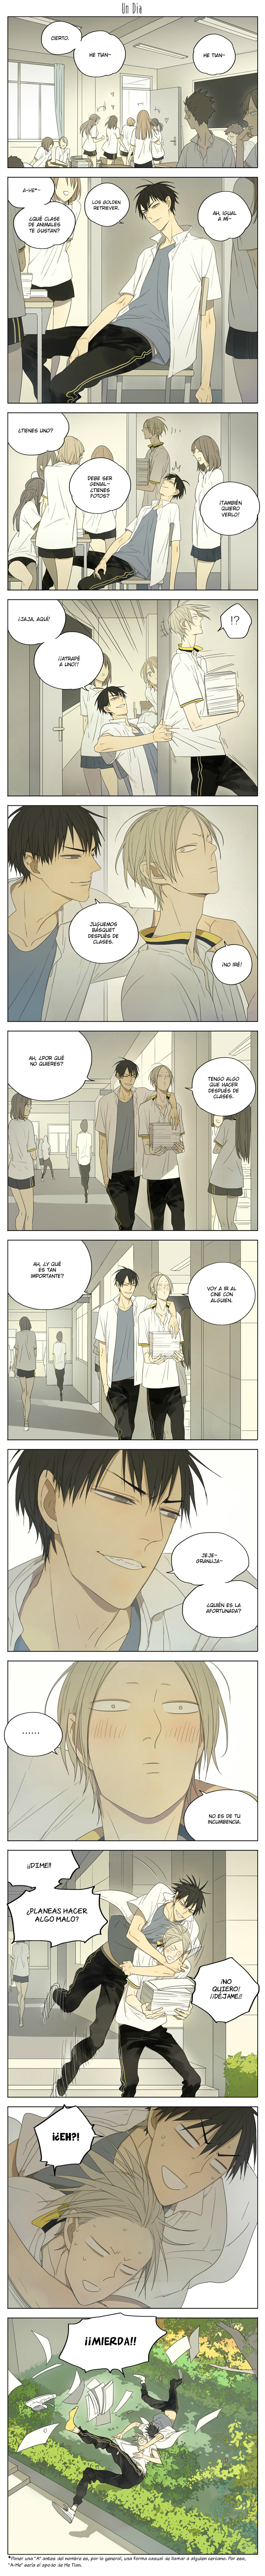 http://c5.ninemanga.com/es_manga/7/15943/392074/788e8dcccb8757a5a7f29481ec1d6fc0.jpg Page 4